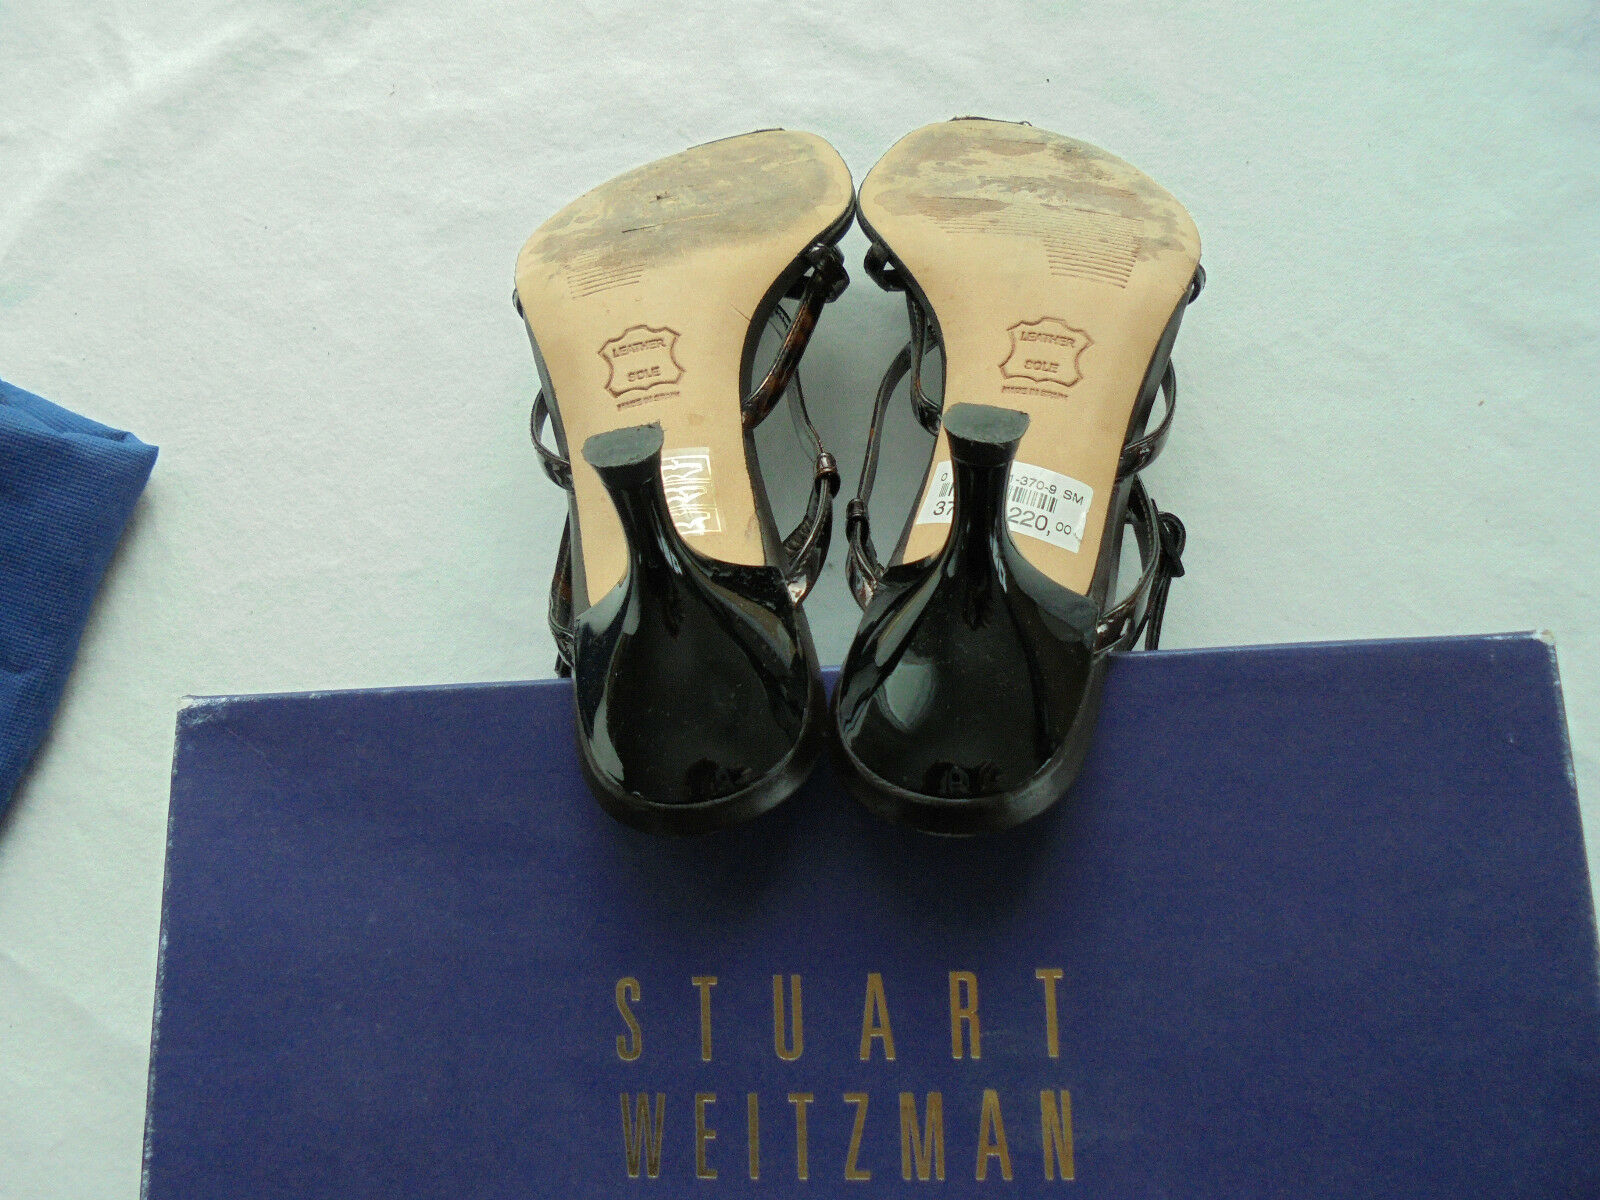 Stuart Weitzman Lackleder Sandalette NP:  w NEU Pumps Schuhe Gr. 37